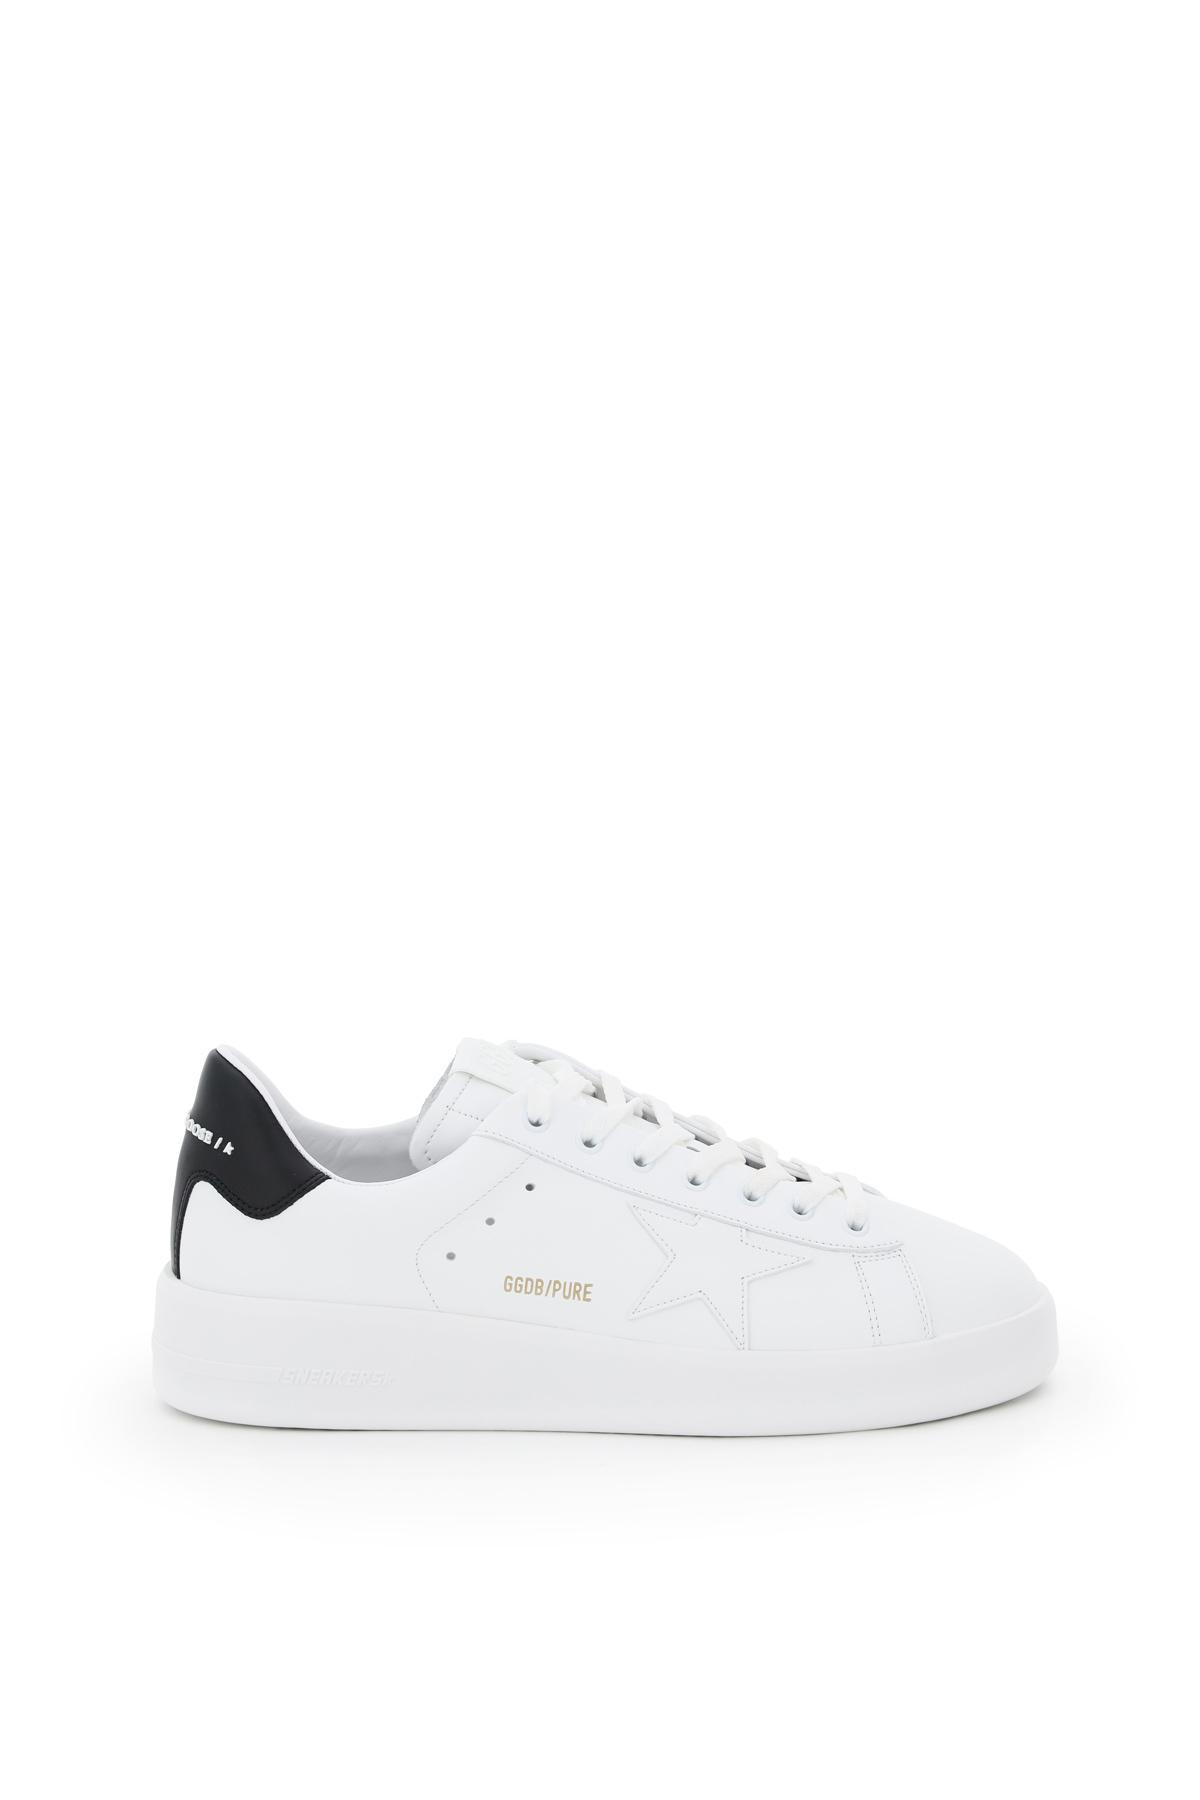 Golden goose sneakers pure new